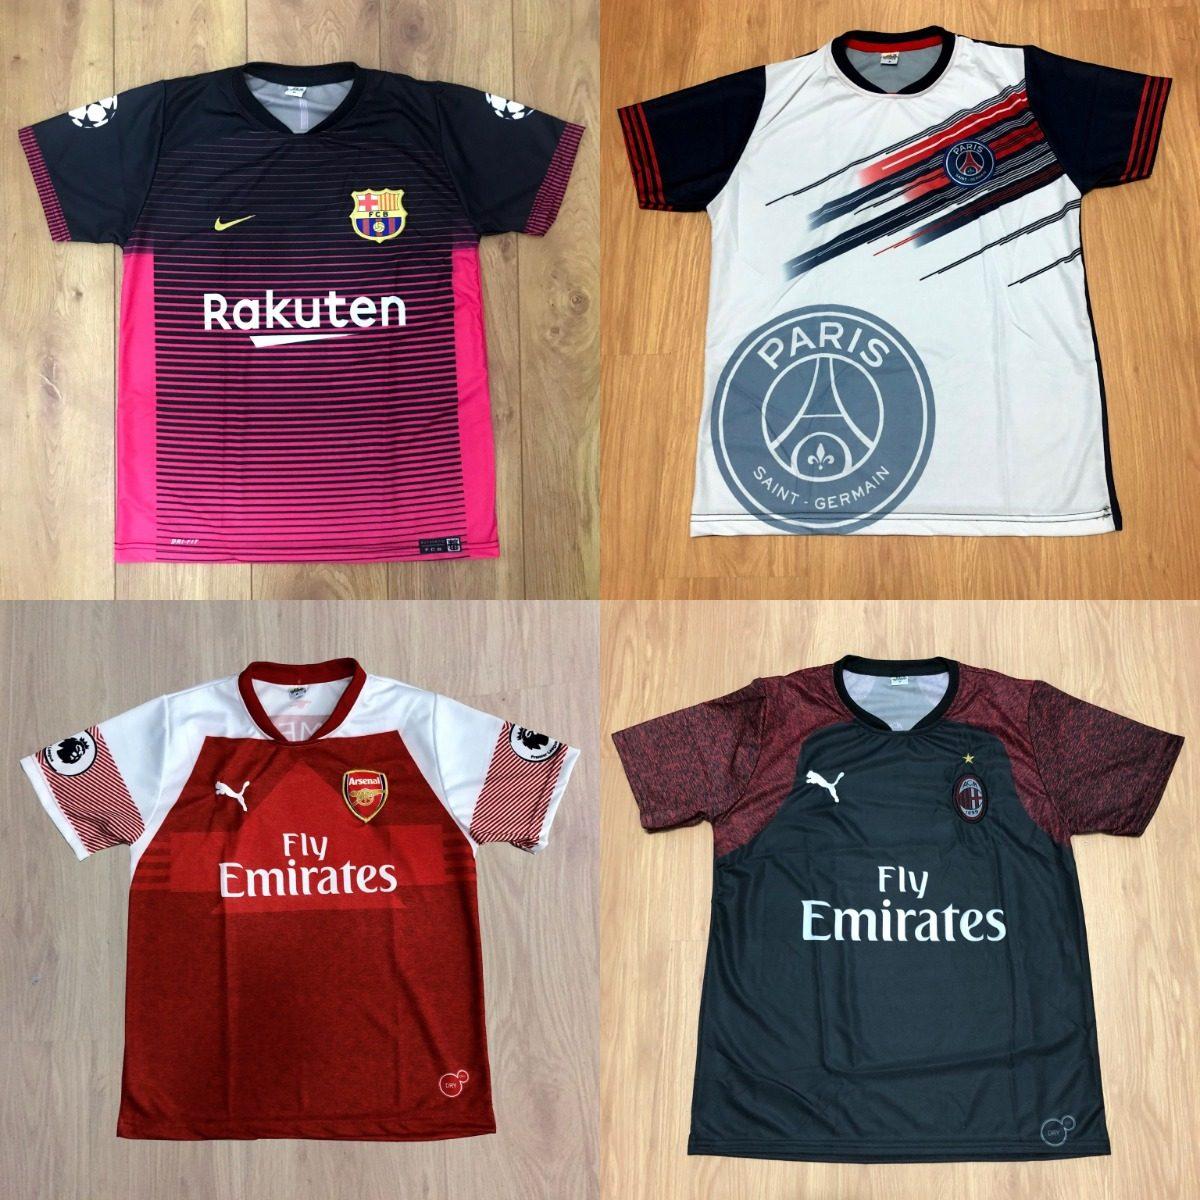 Kit 5 Camisetas De Time Camisas De Futebol 100 Modelos 2018 - R  119 ... c76758c8f6b57